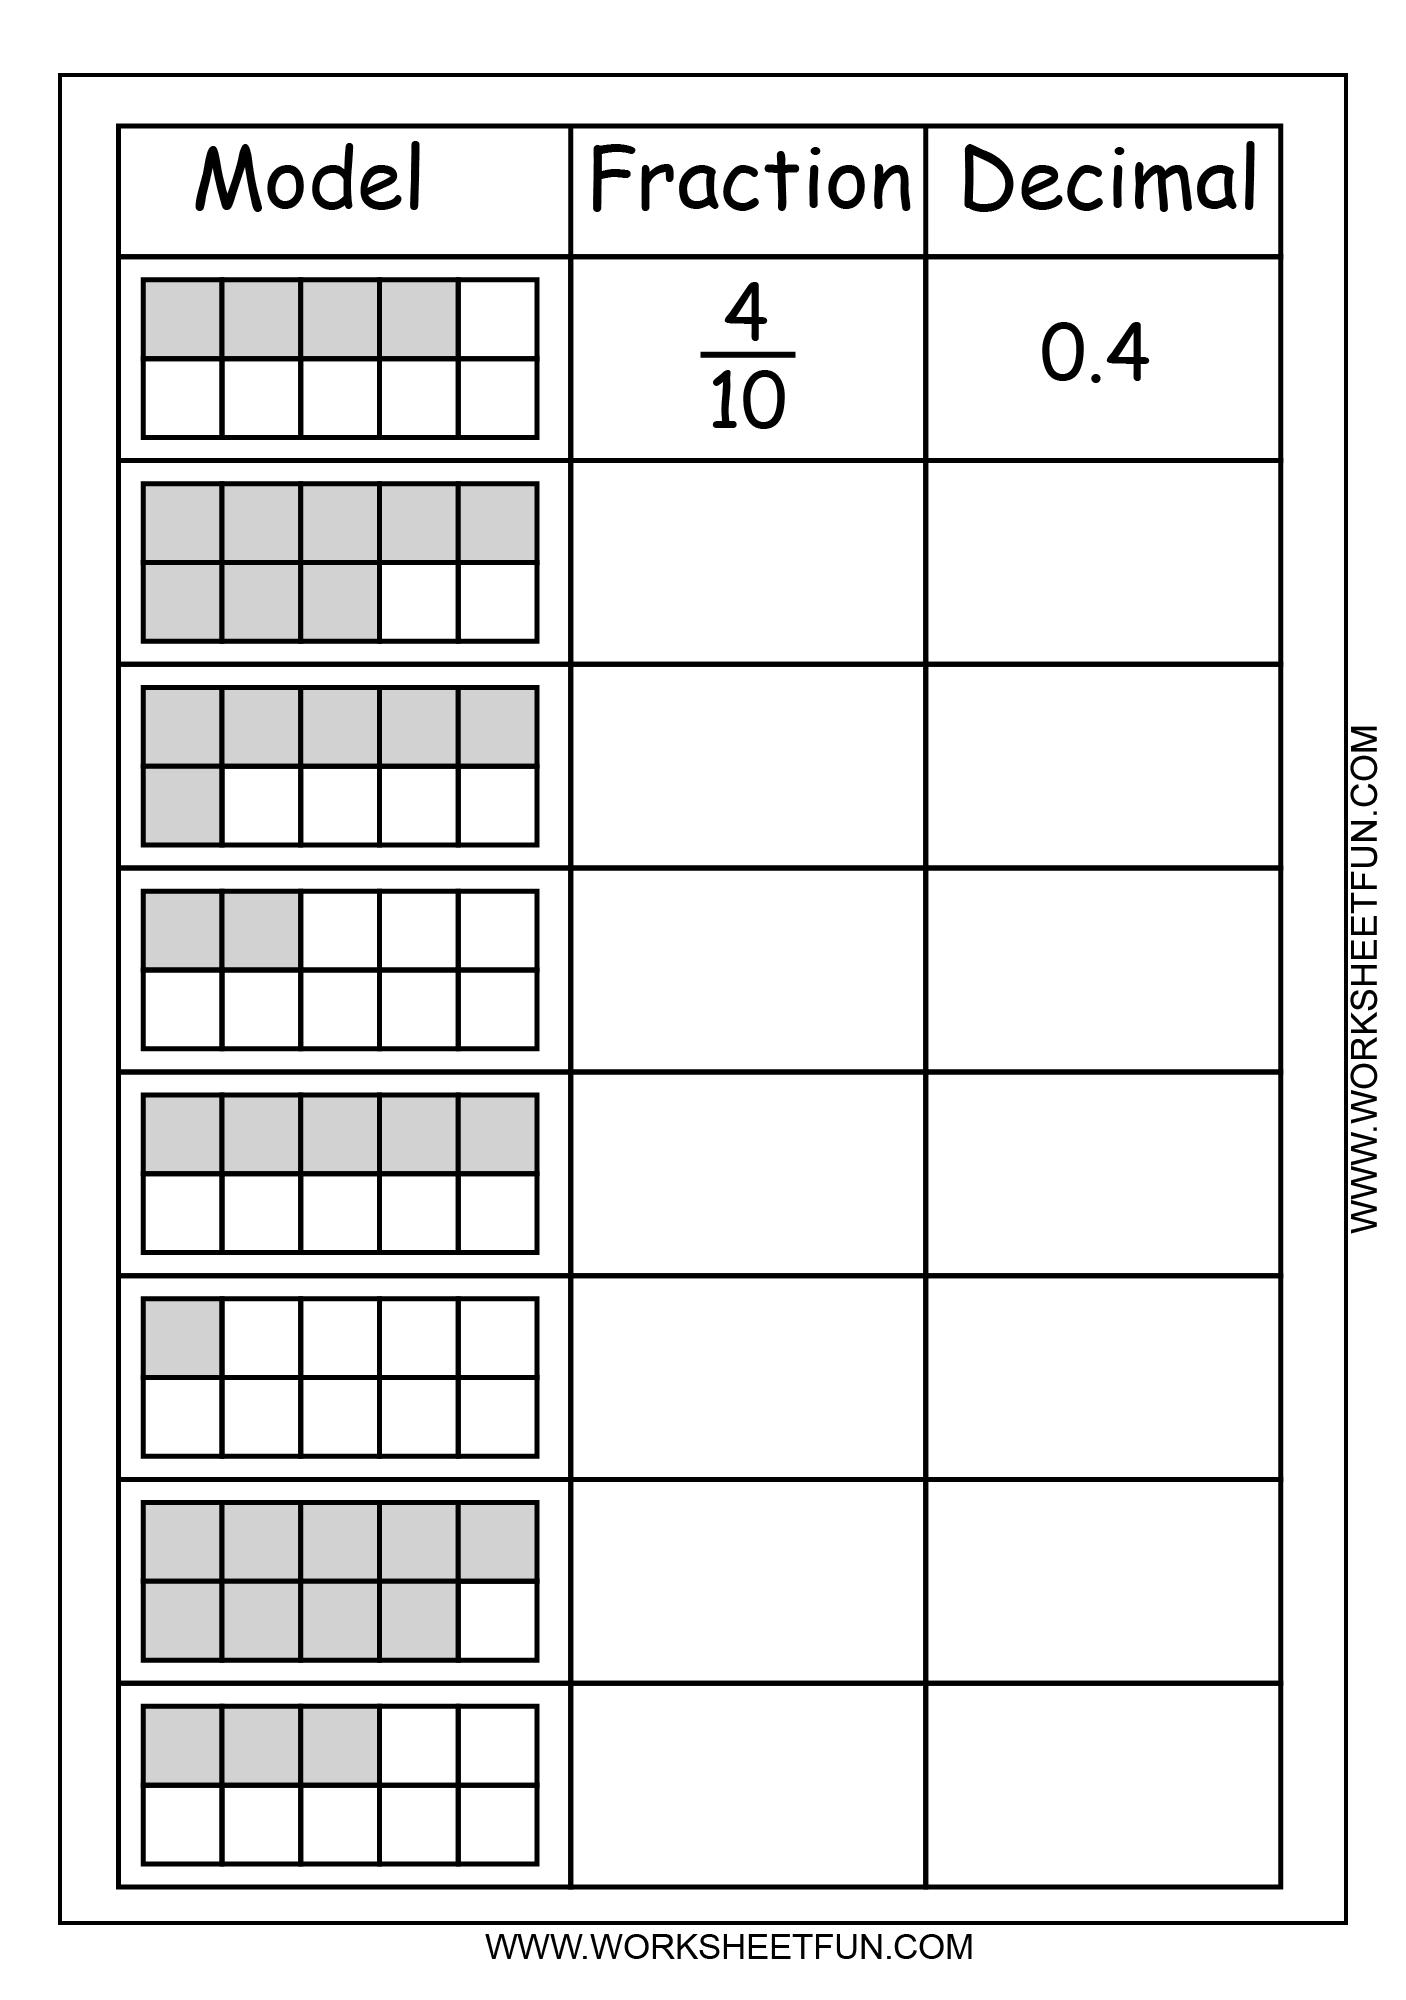 model-fraction-decimal-2.png 1 [ 2000 x 1406 Pixel ]